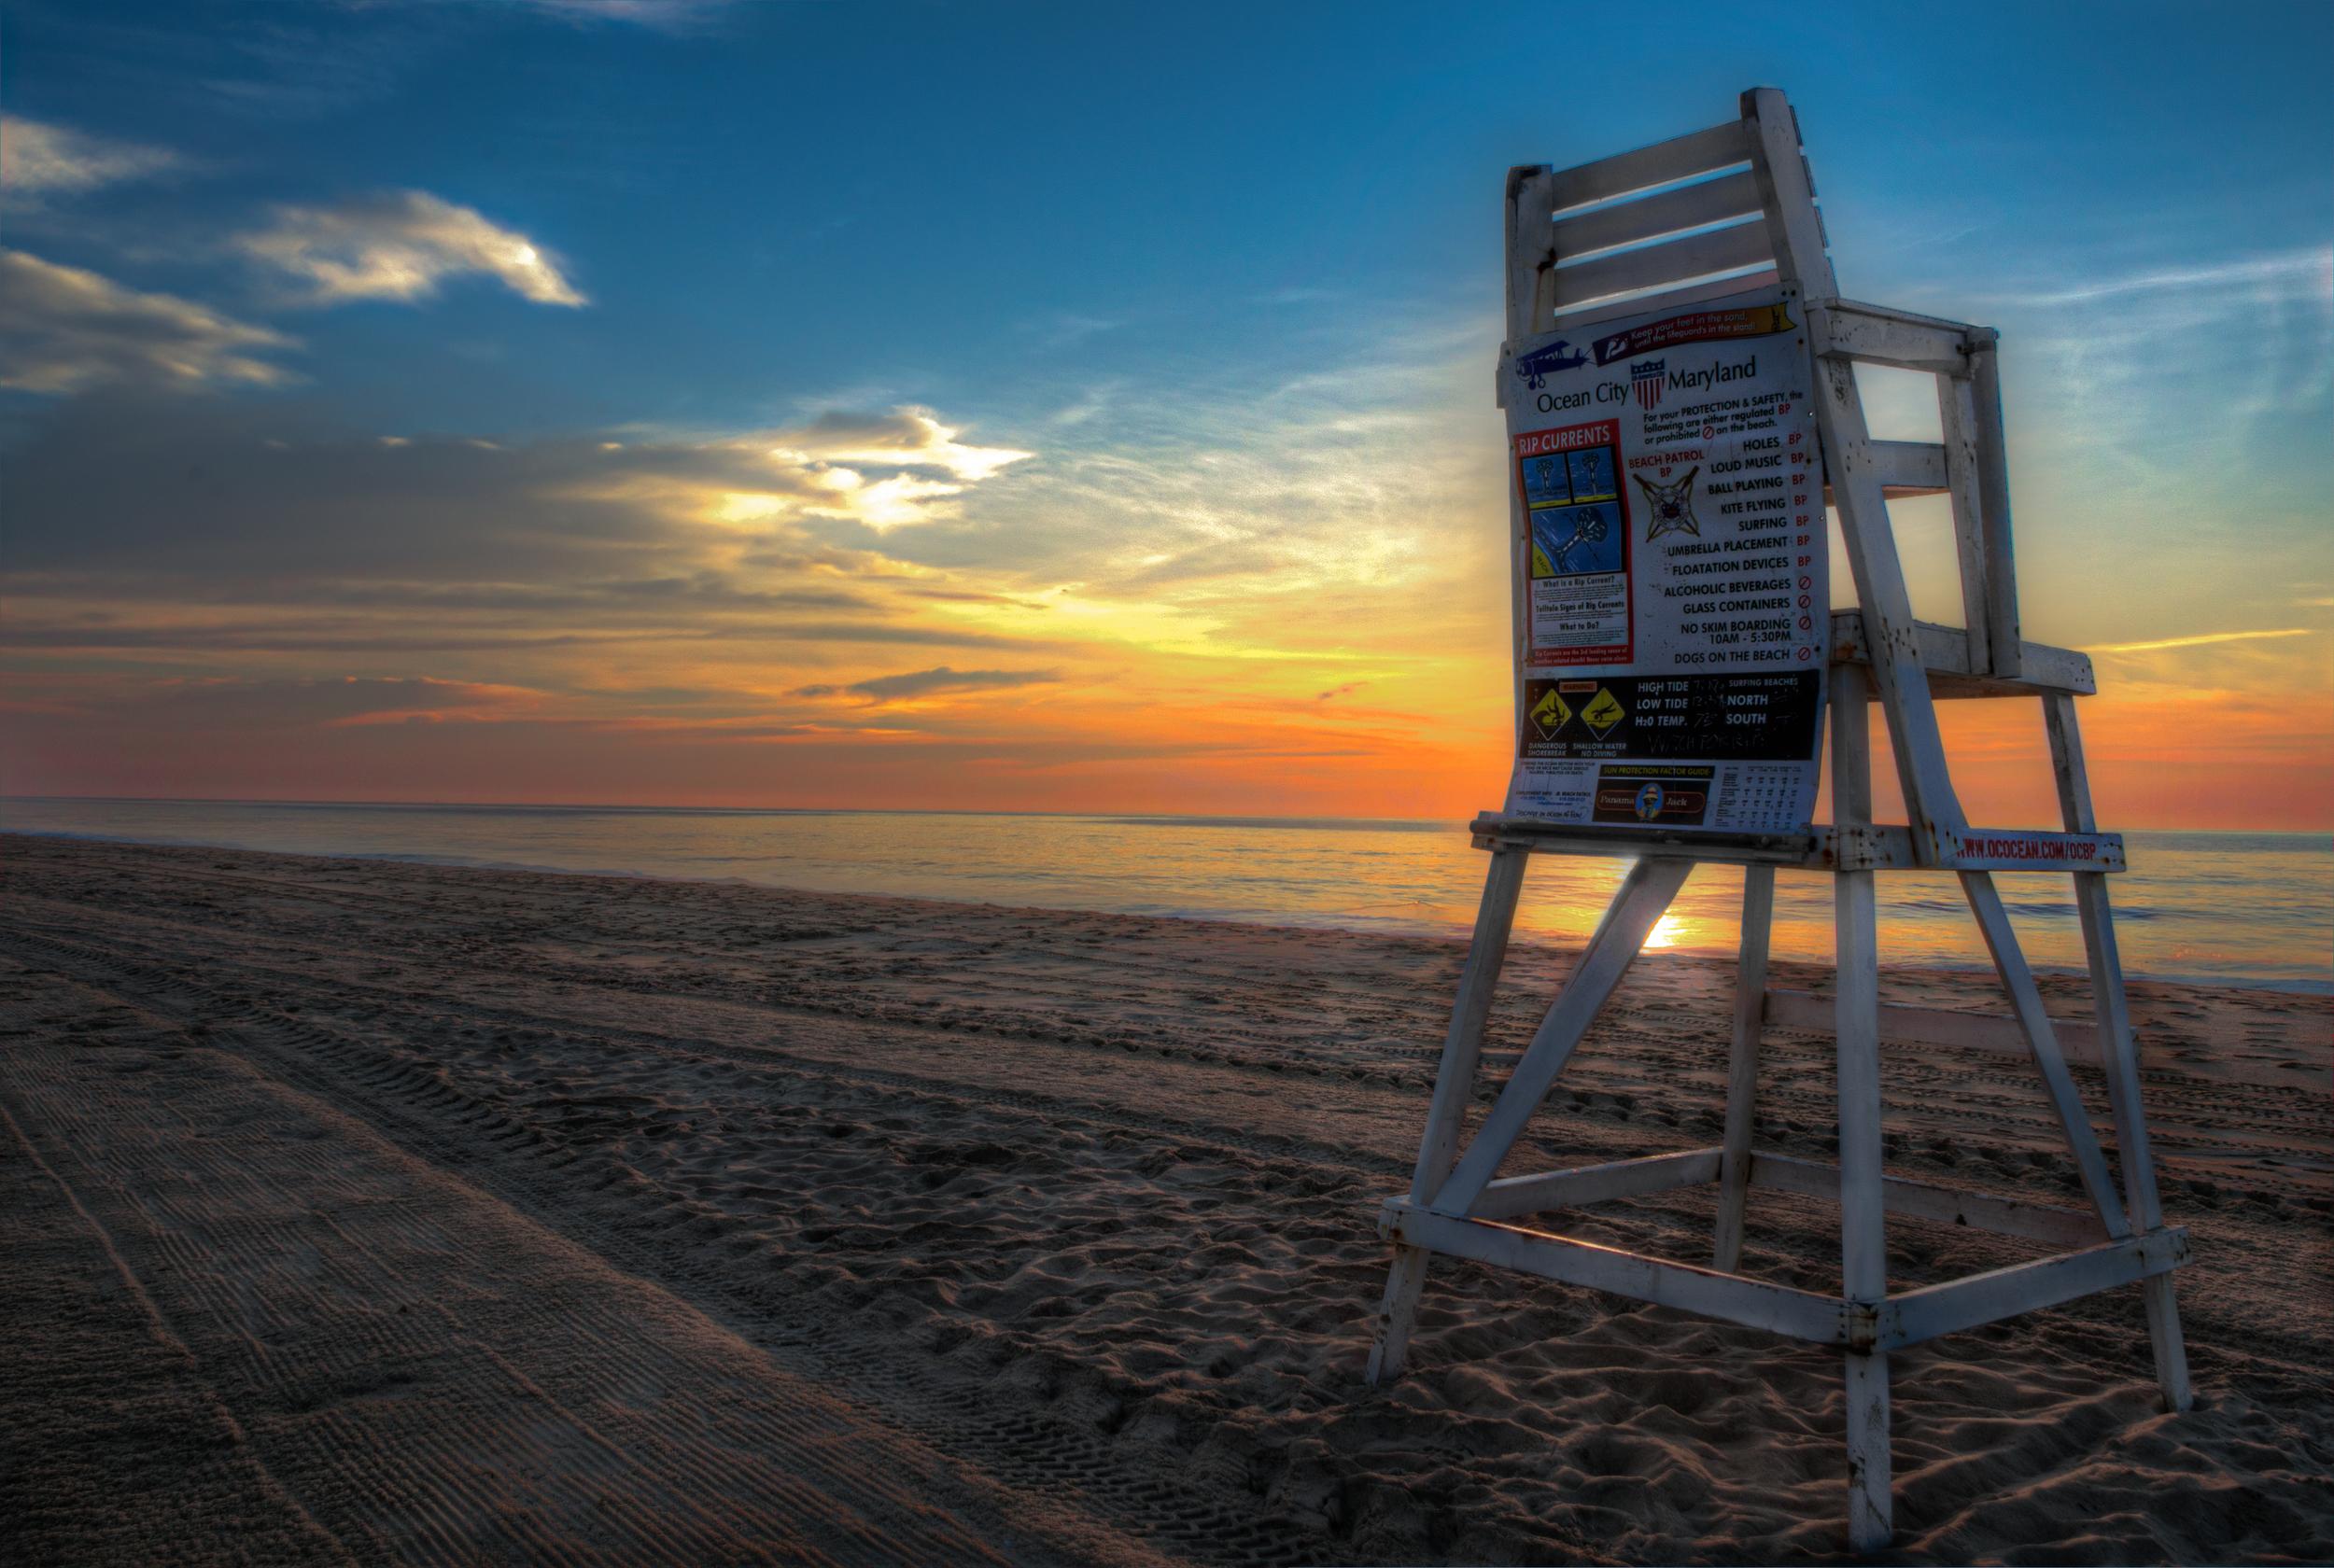 Ocean City Lifeguard Sunrise